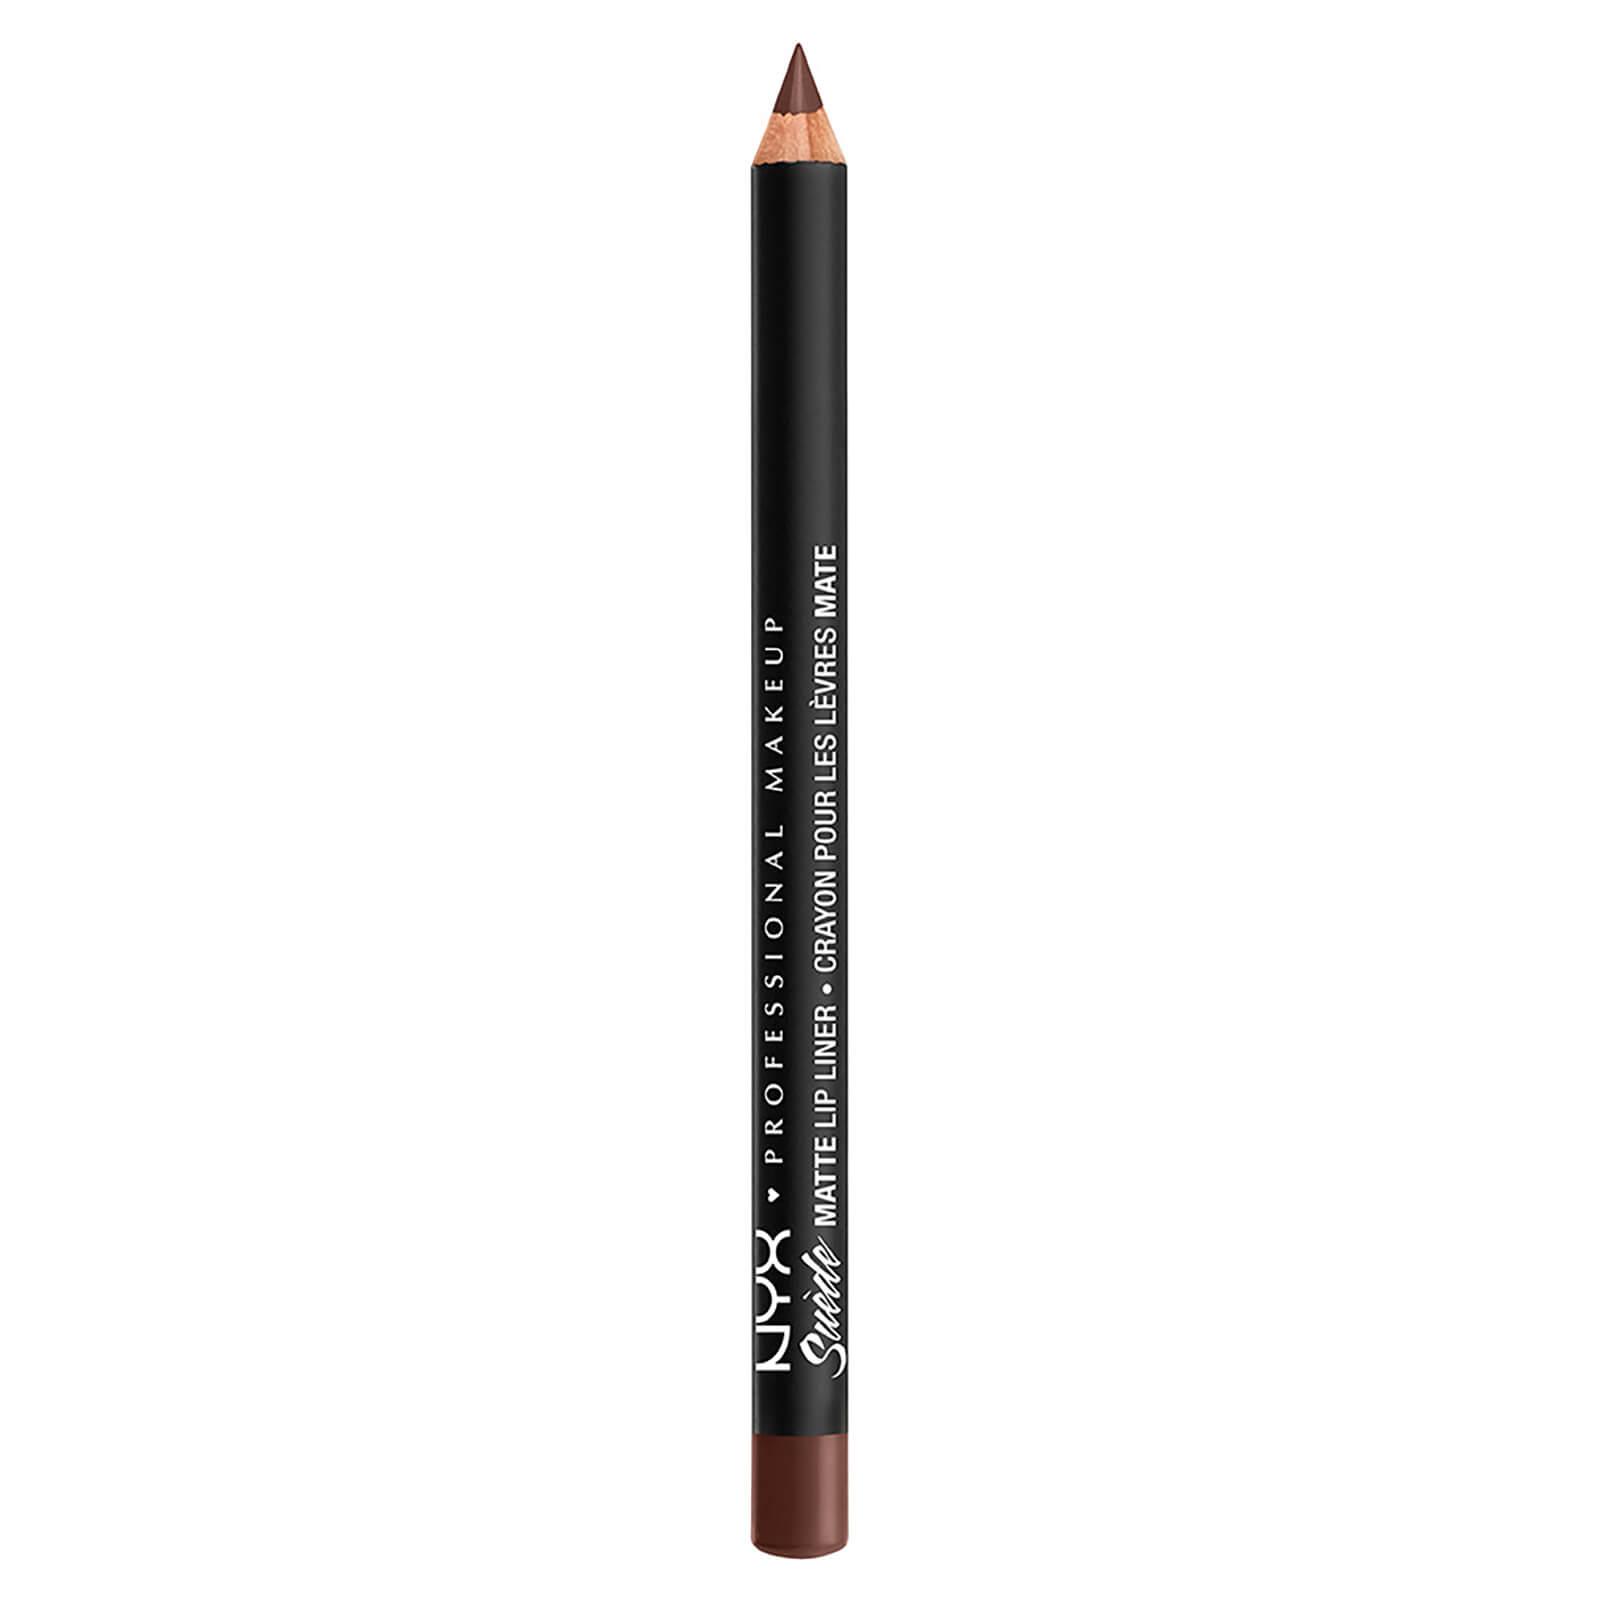 nyx professional makeup suede matte lip liner (various shades) - club hopper